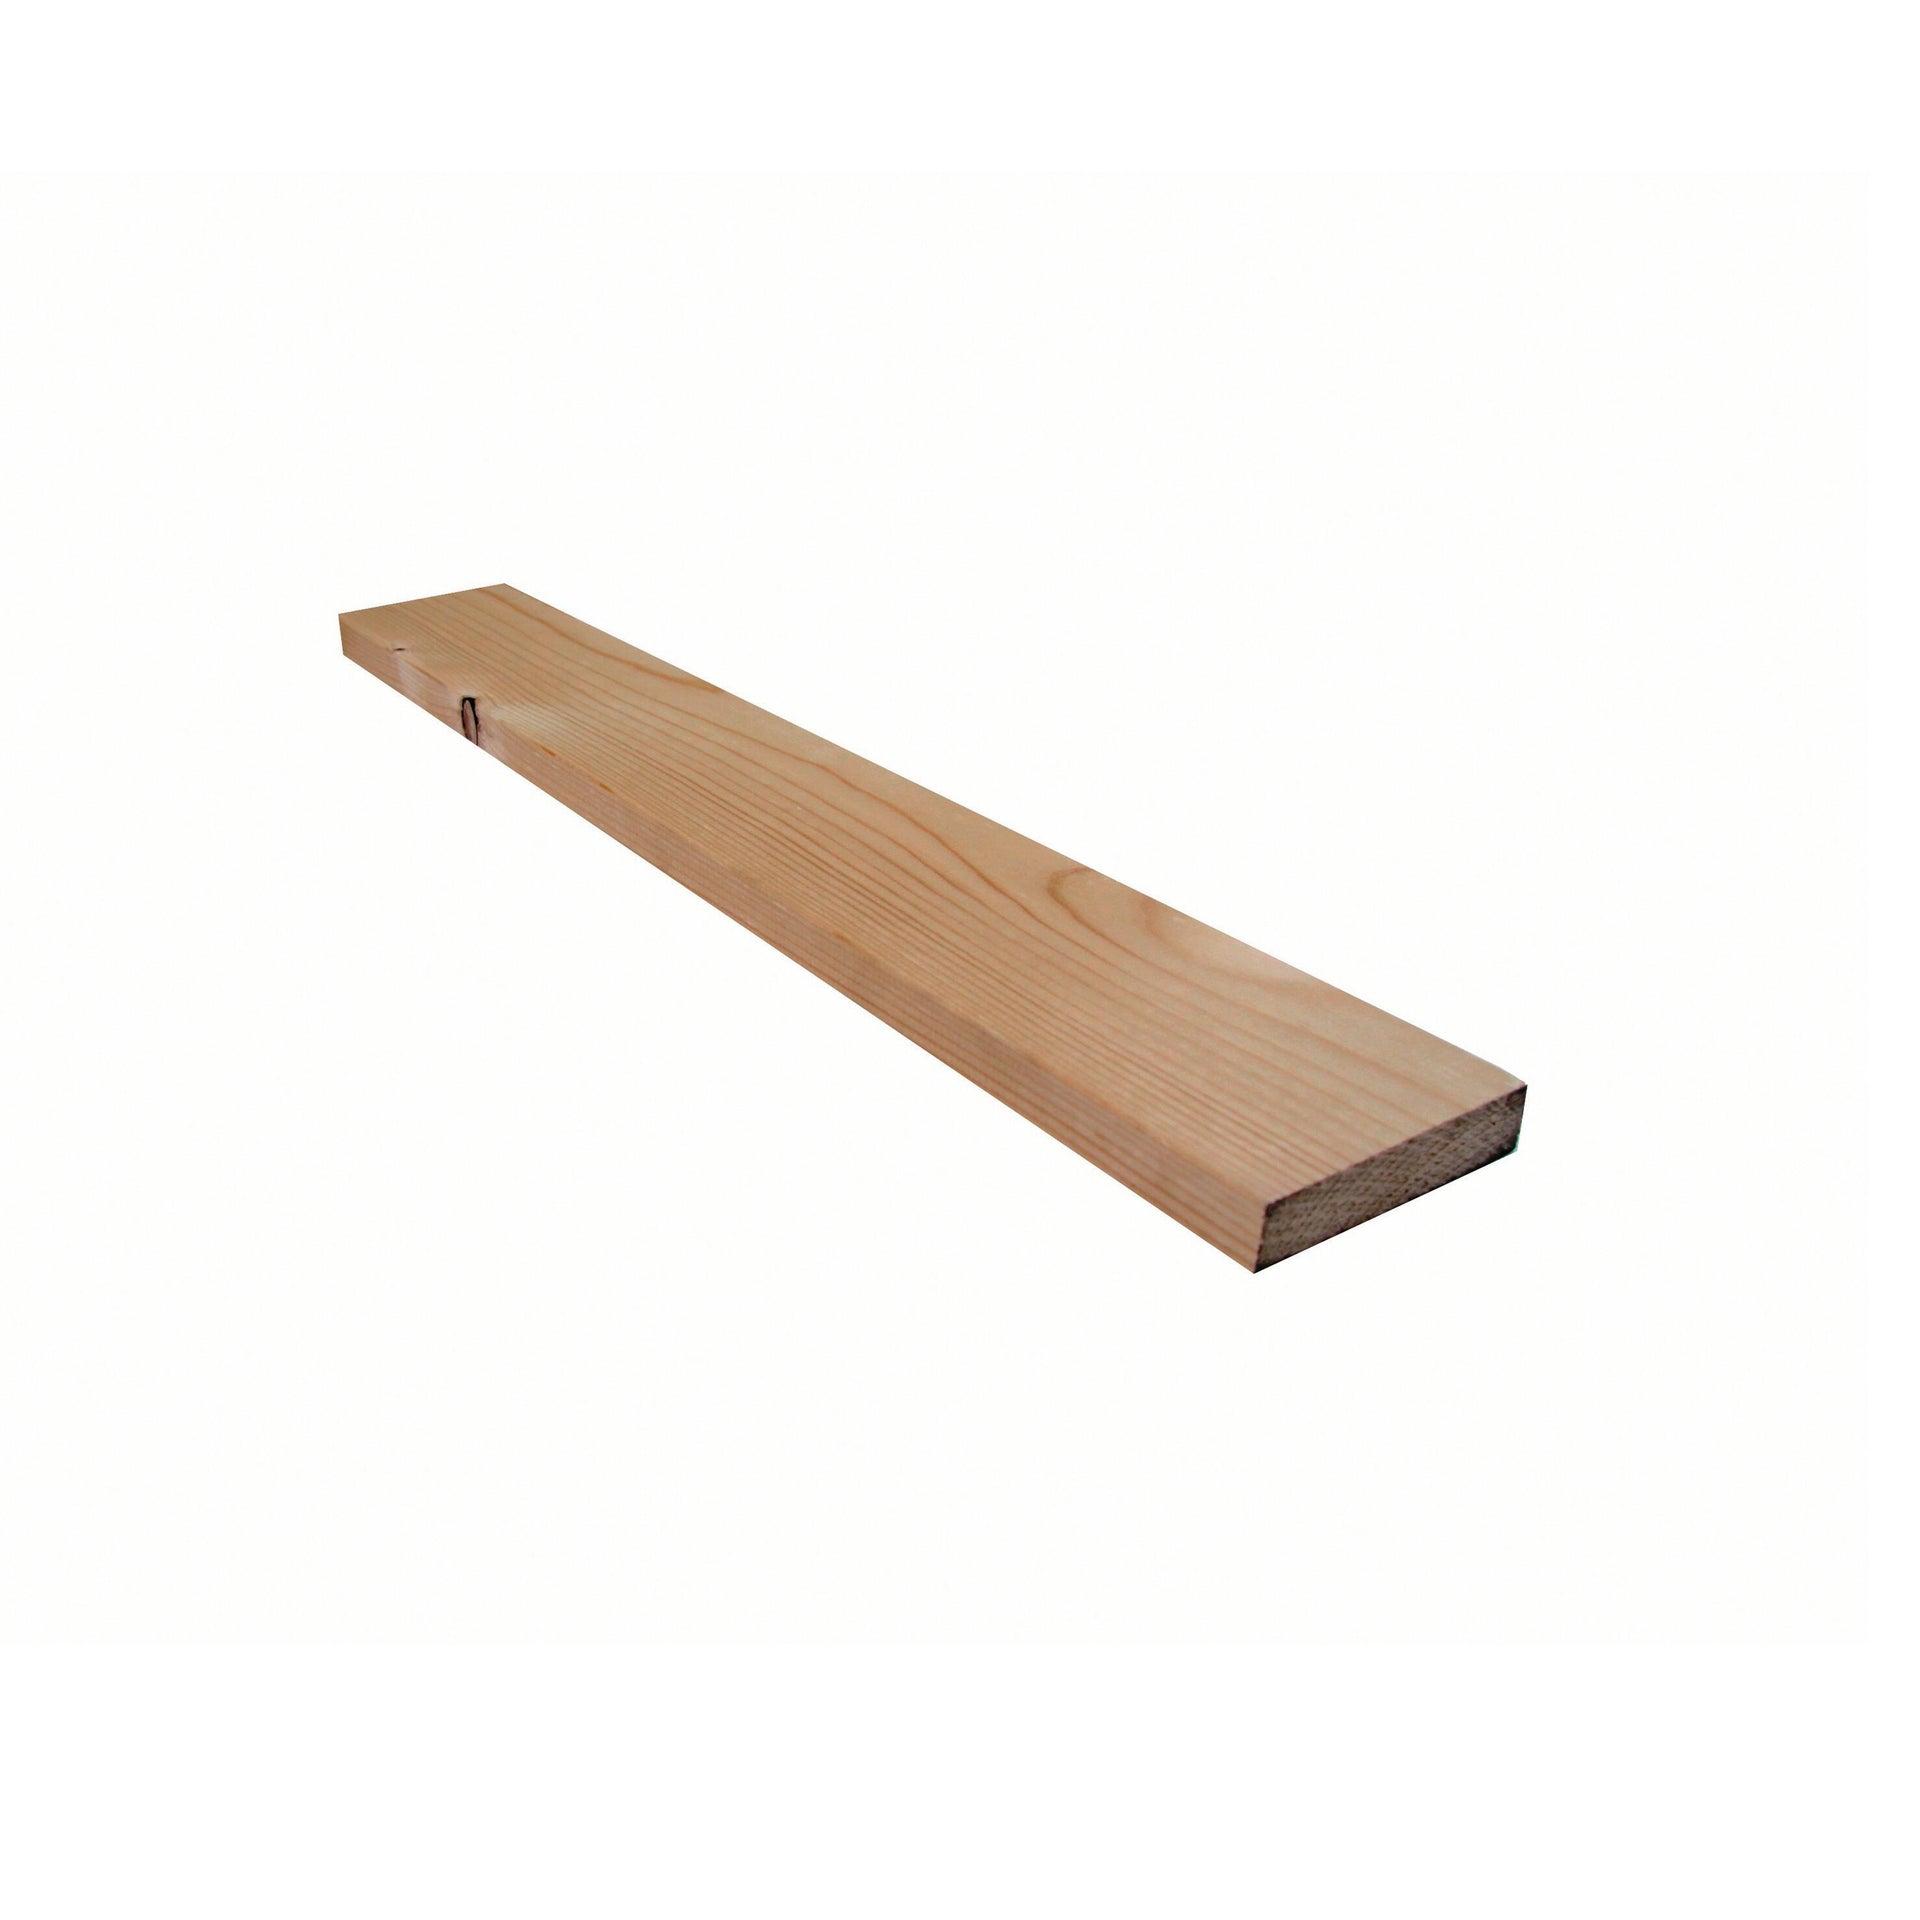 Listello piallato abete 3 m x 95 mm, Sp 20 mm